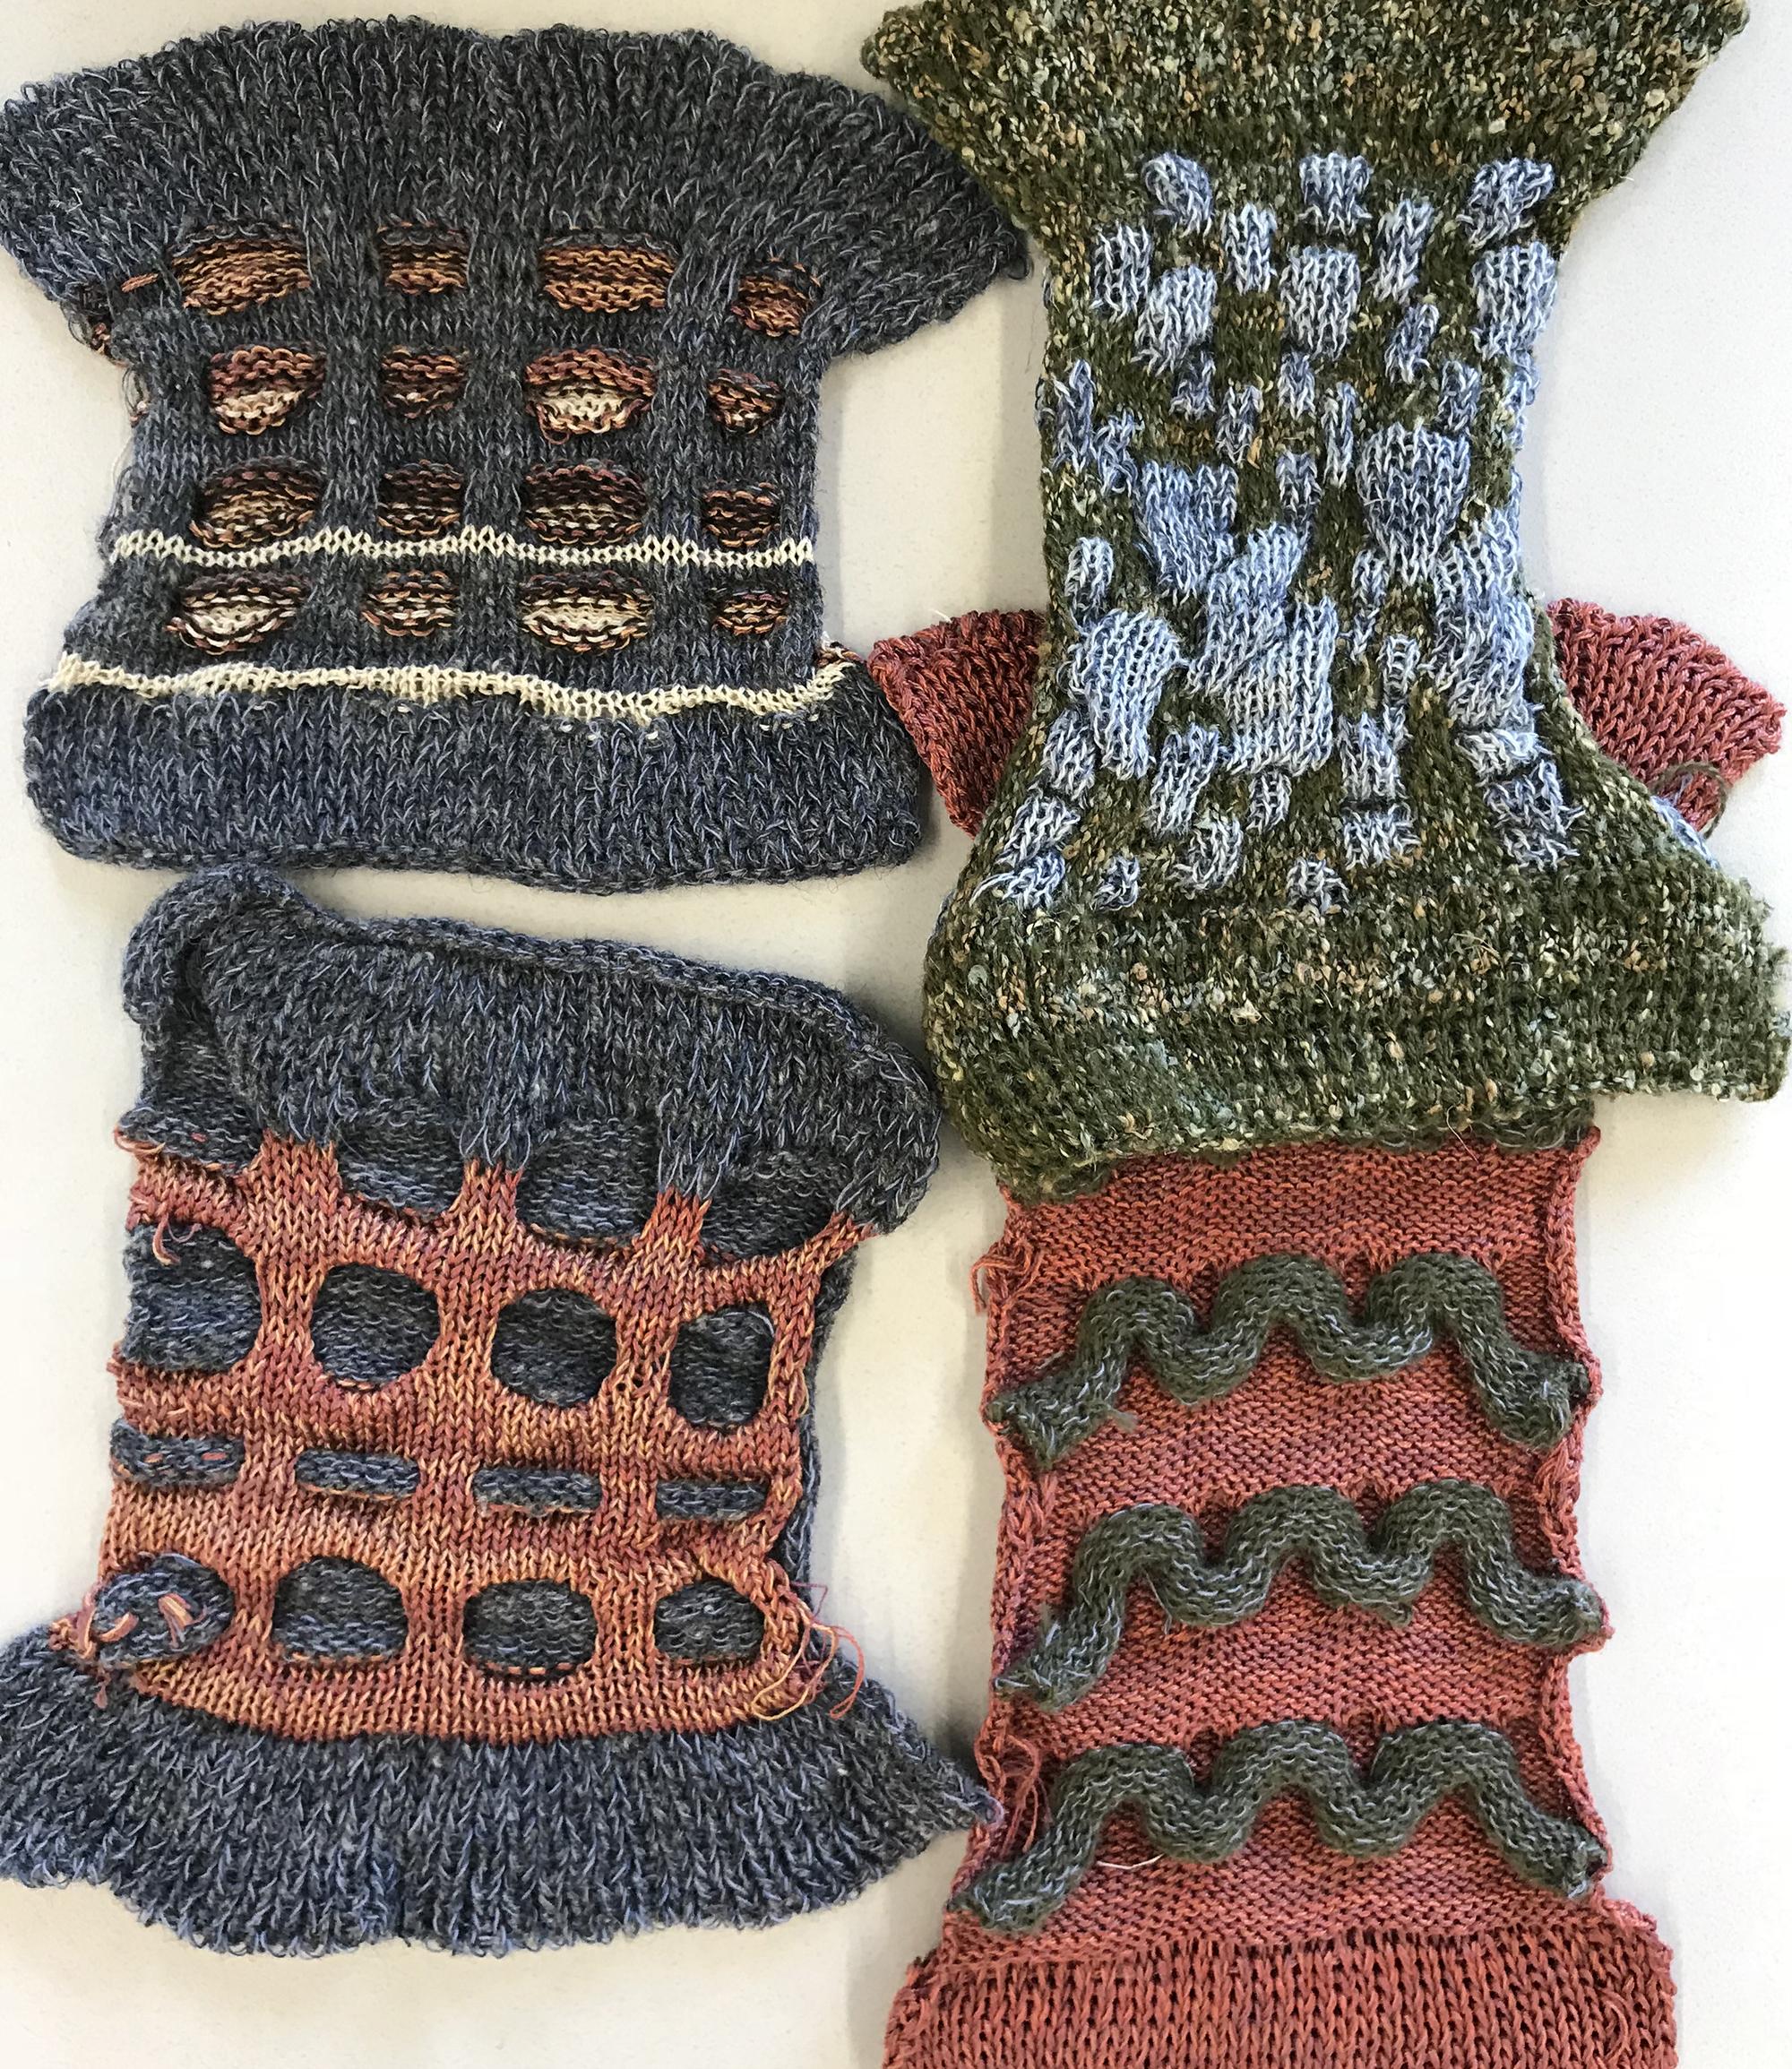 Peter Salera swatches knit on Passap